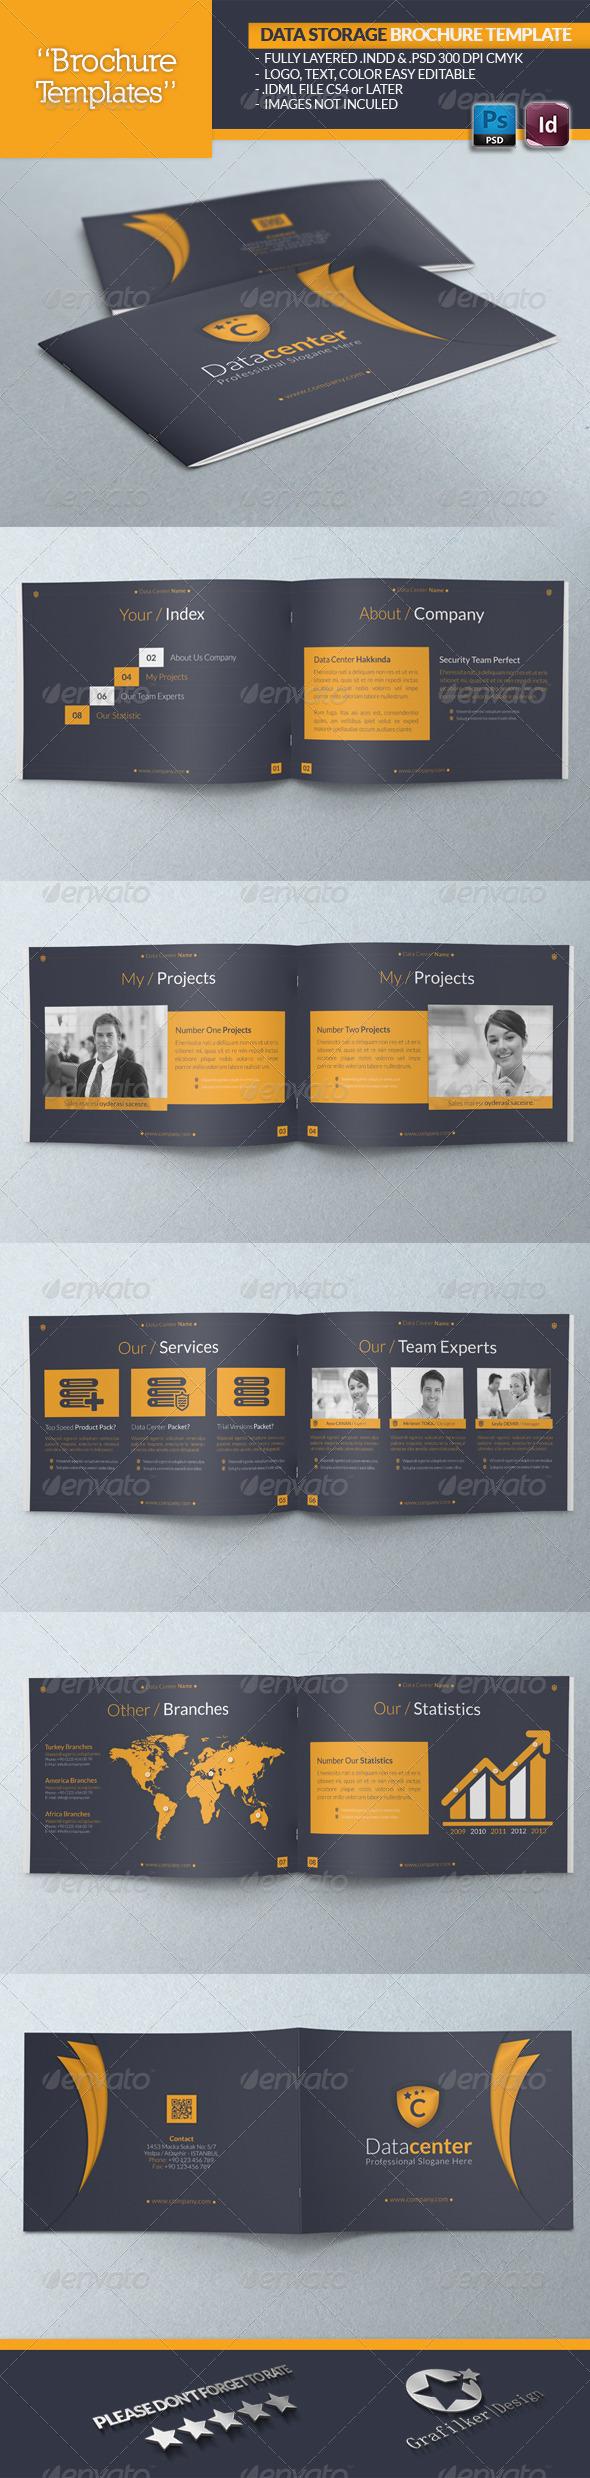 Data Storage Brochure Template - Brochures Print Templates